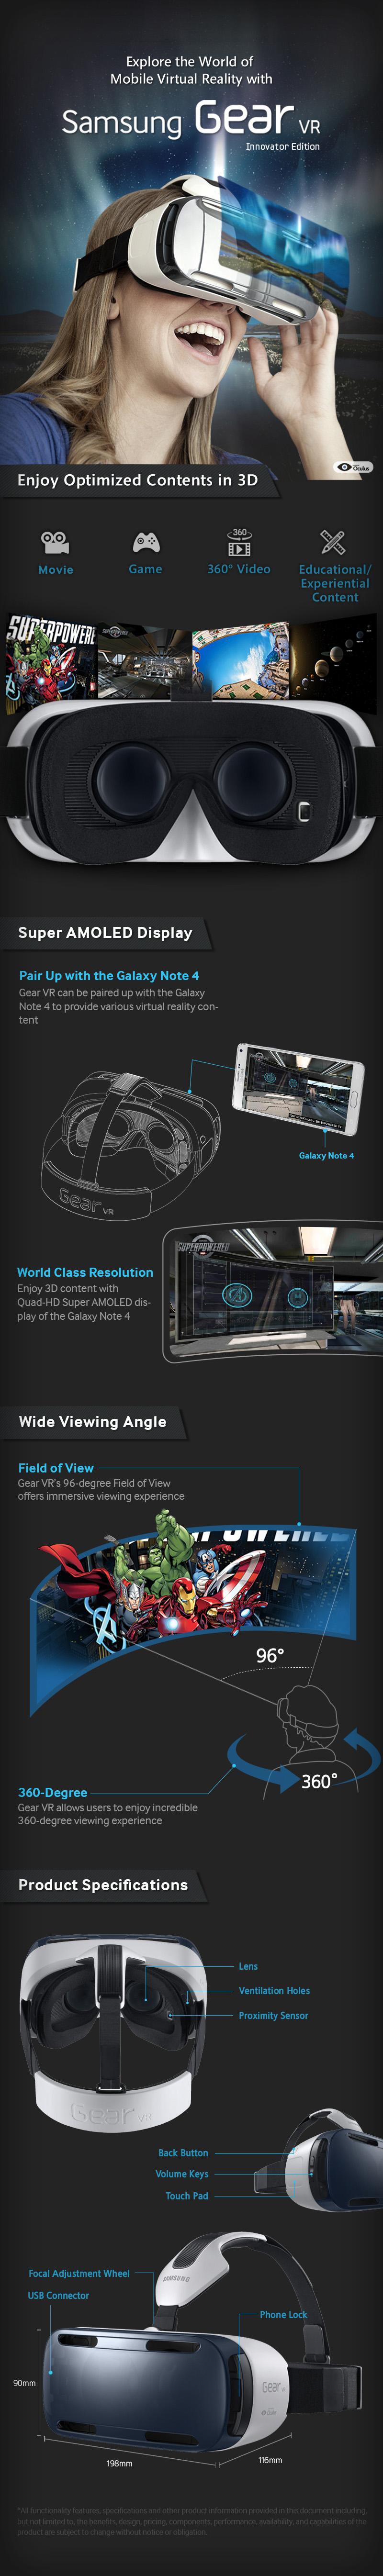 Samsung Gear VR Infographic